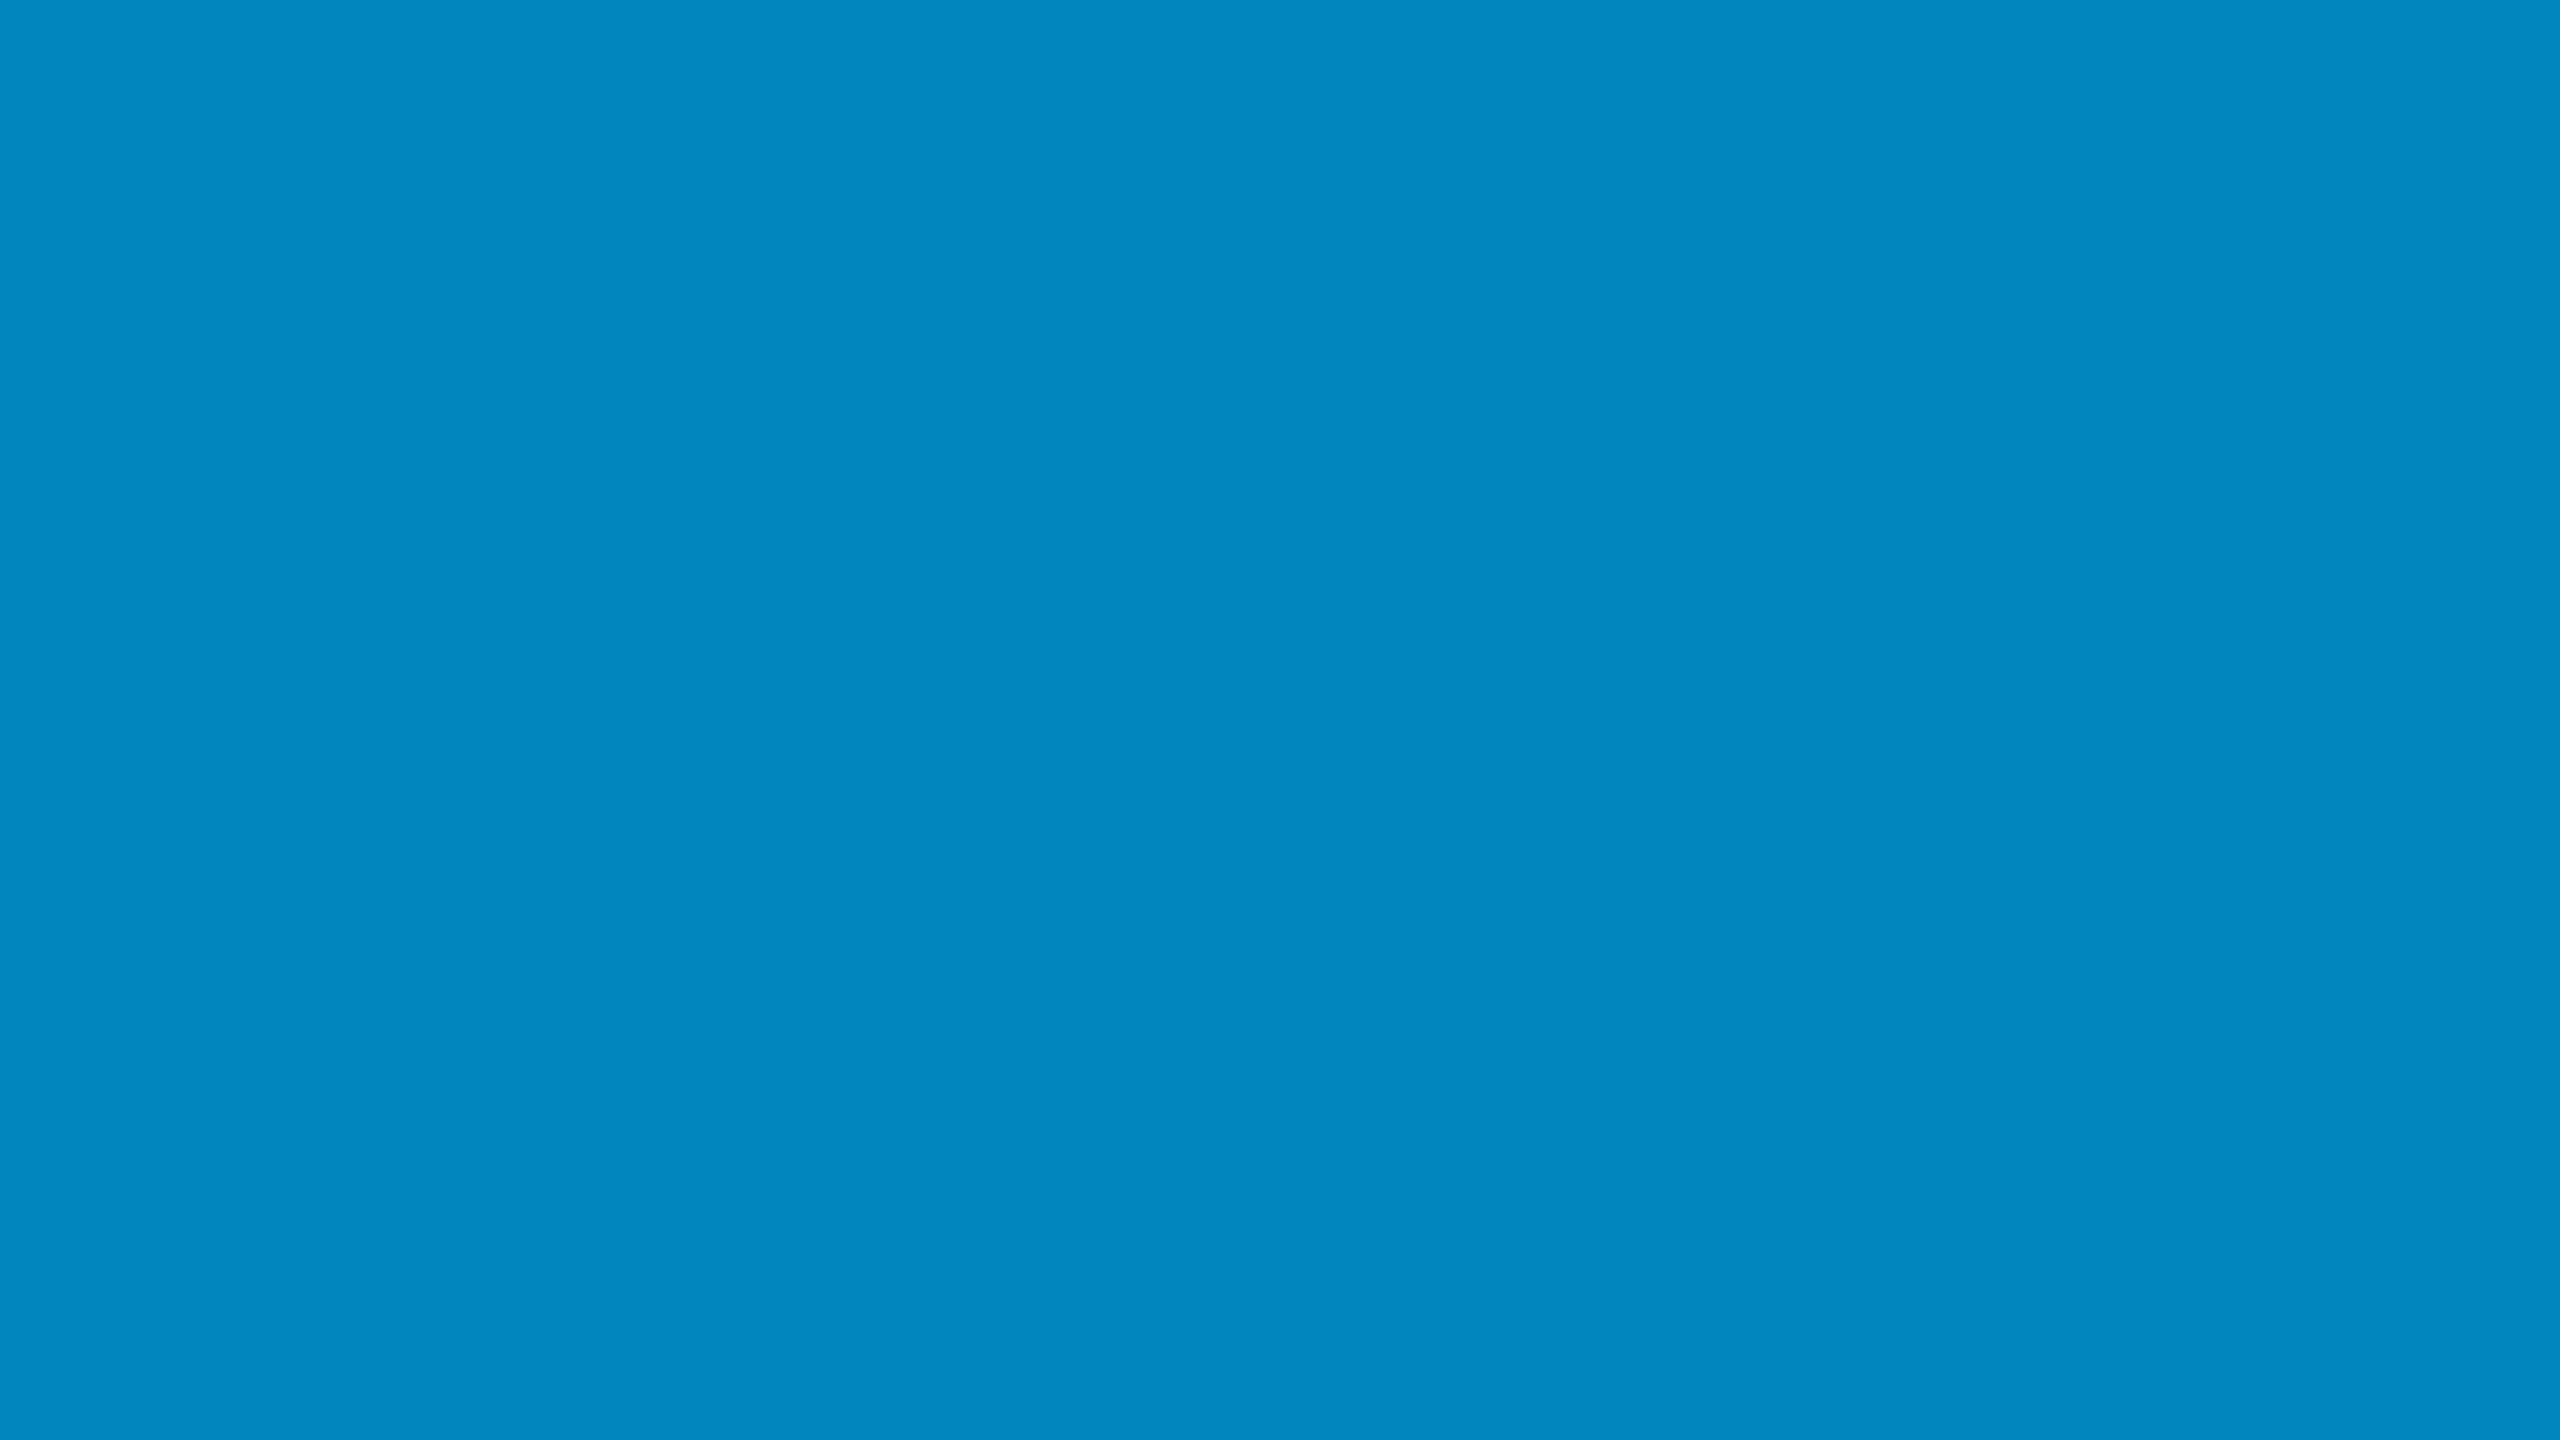 2560x1440 Blue NCS Solid Color Background